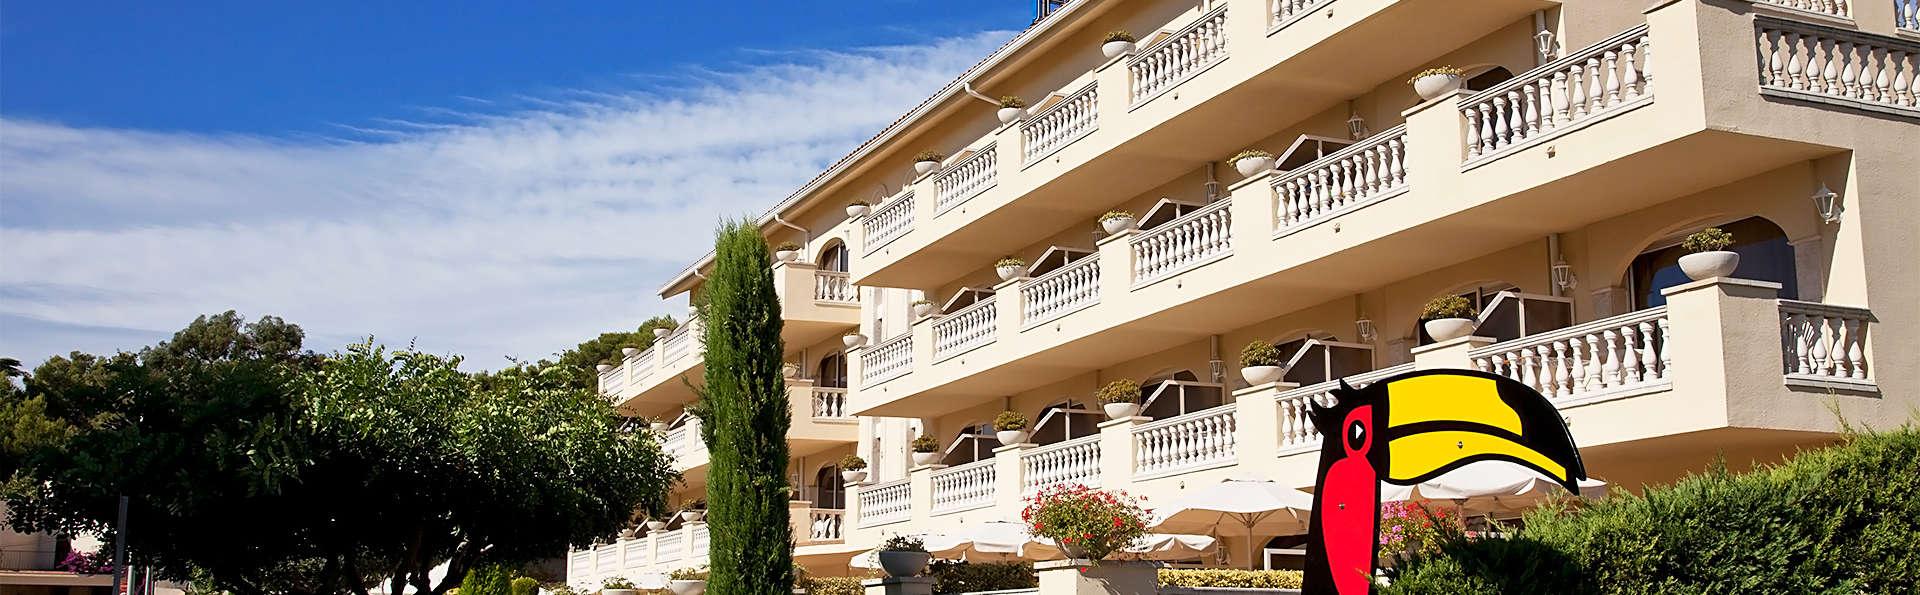 Van der Valk Hotel Barcarola - EDIT_facade.jpg